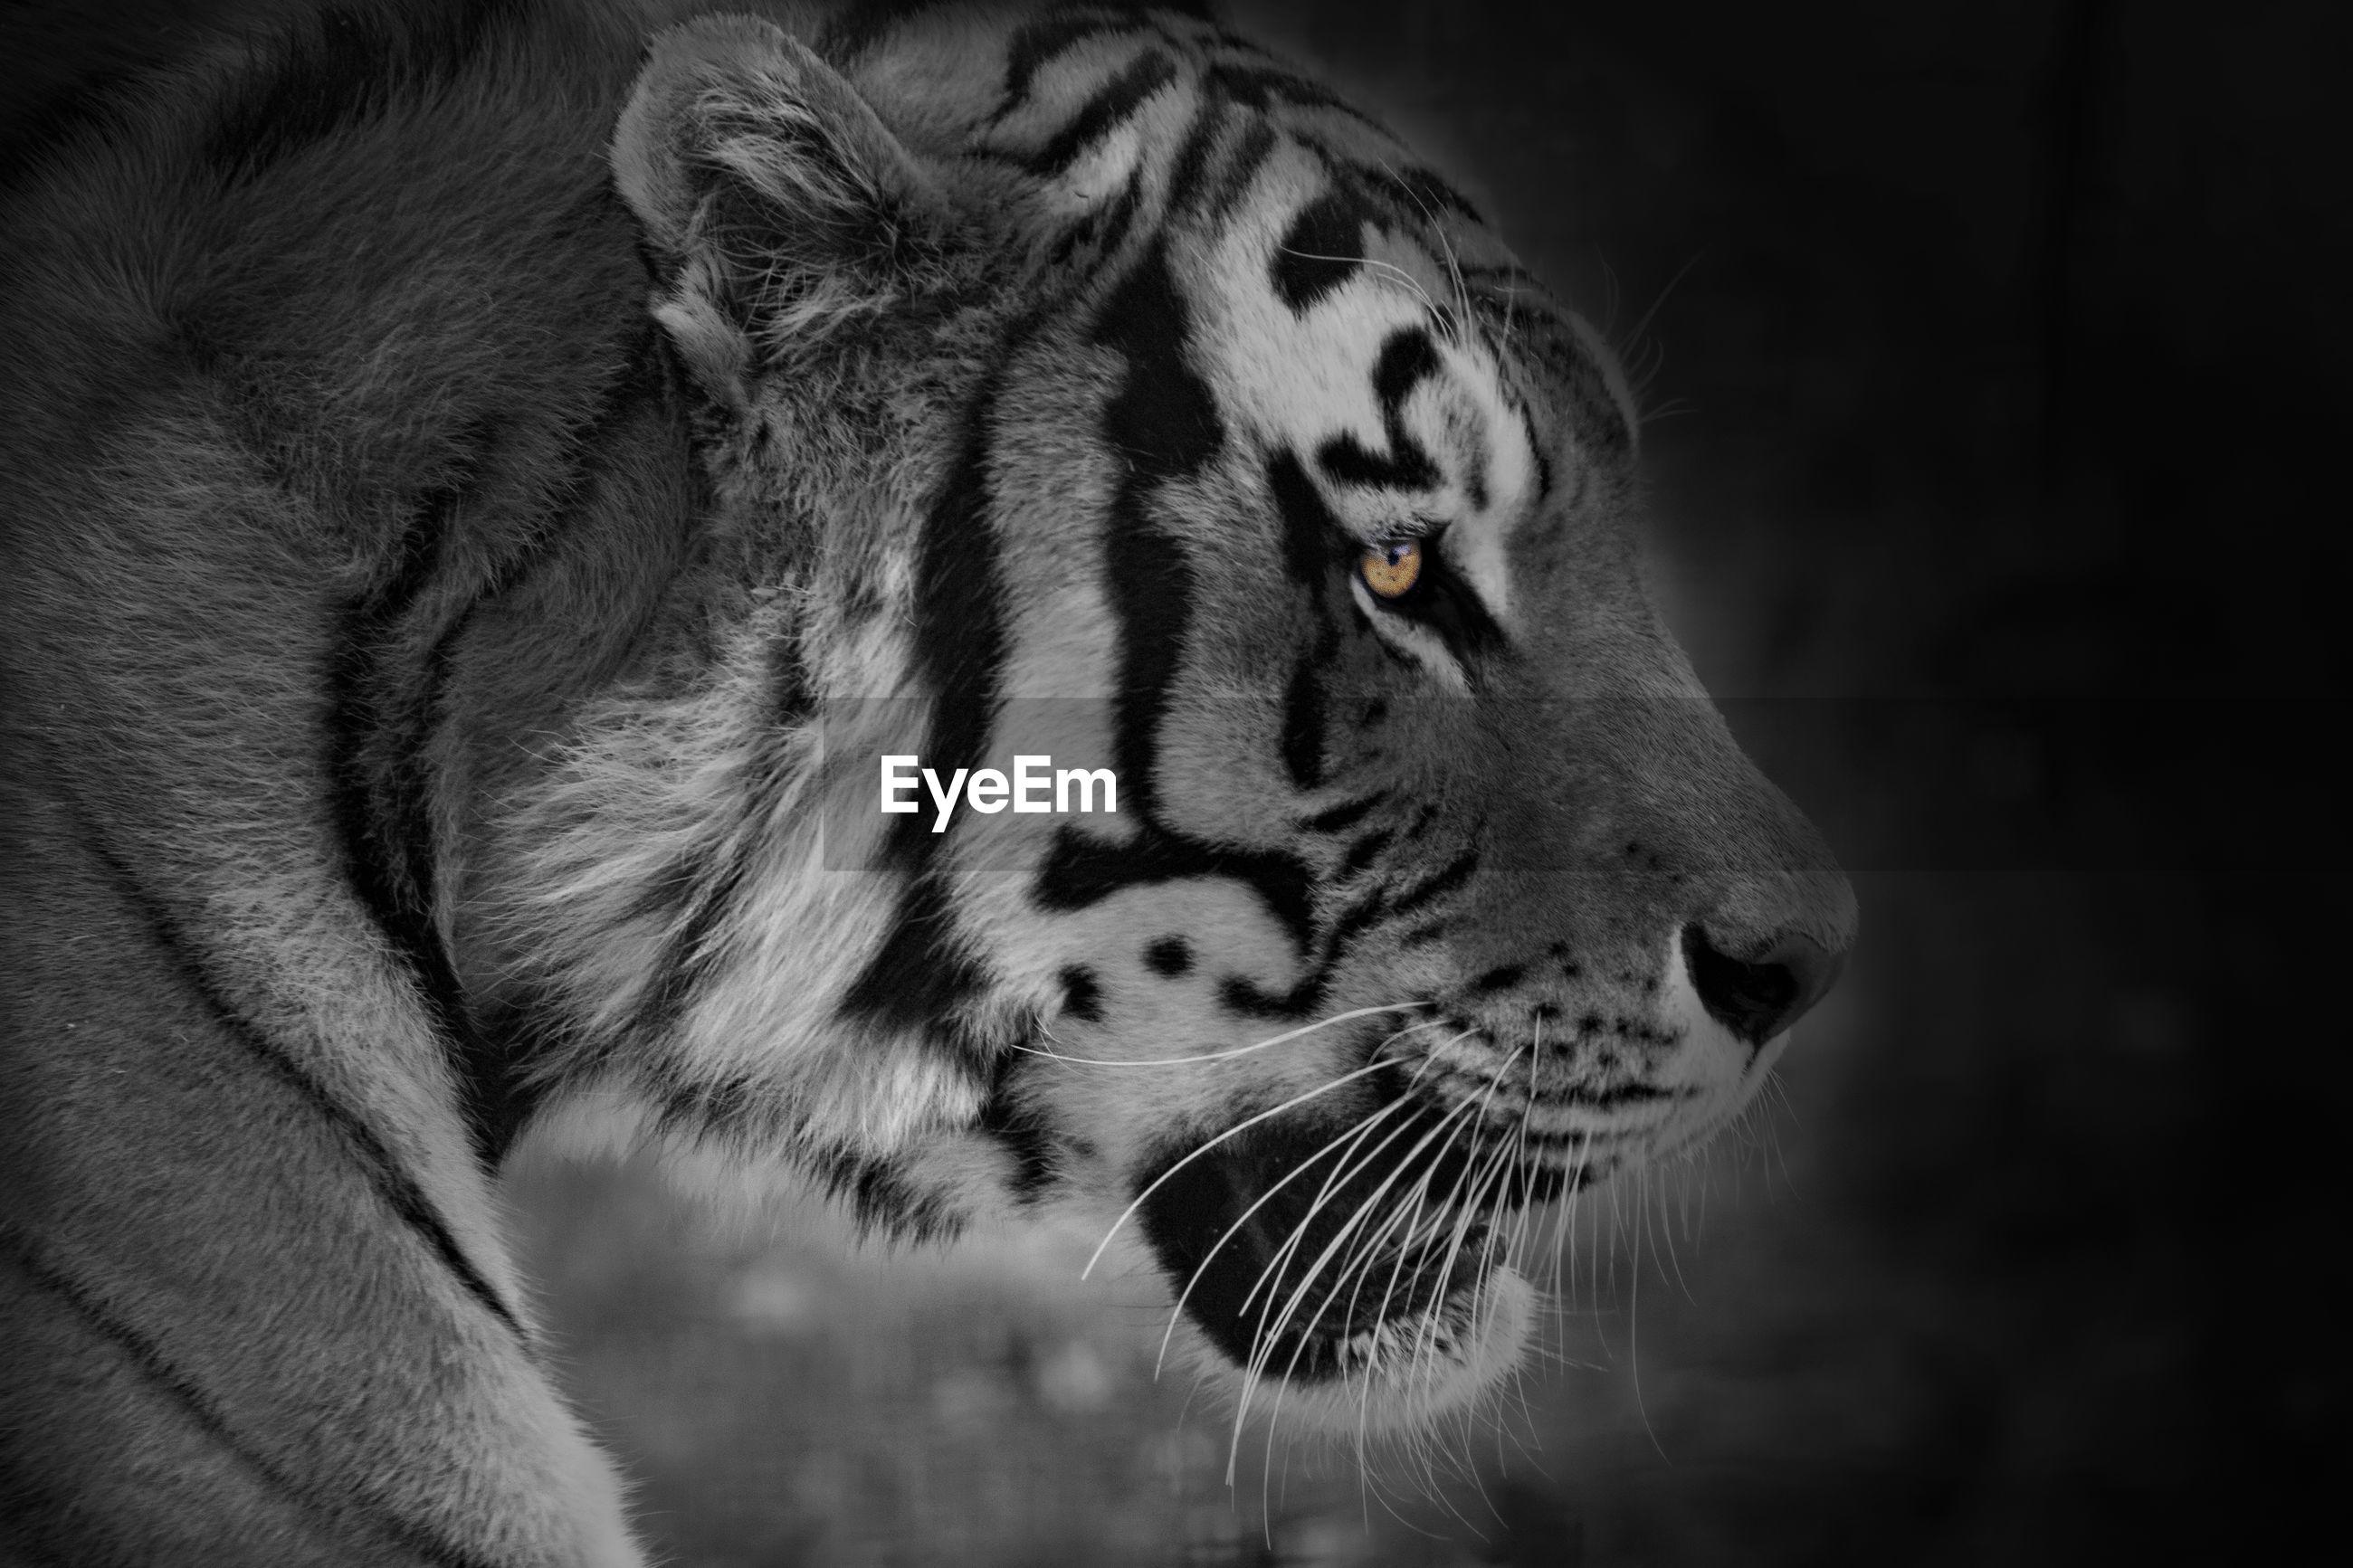 Close-up of tiger against black background